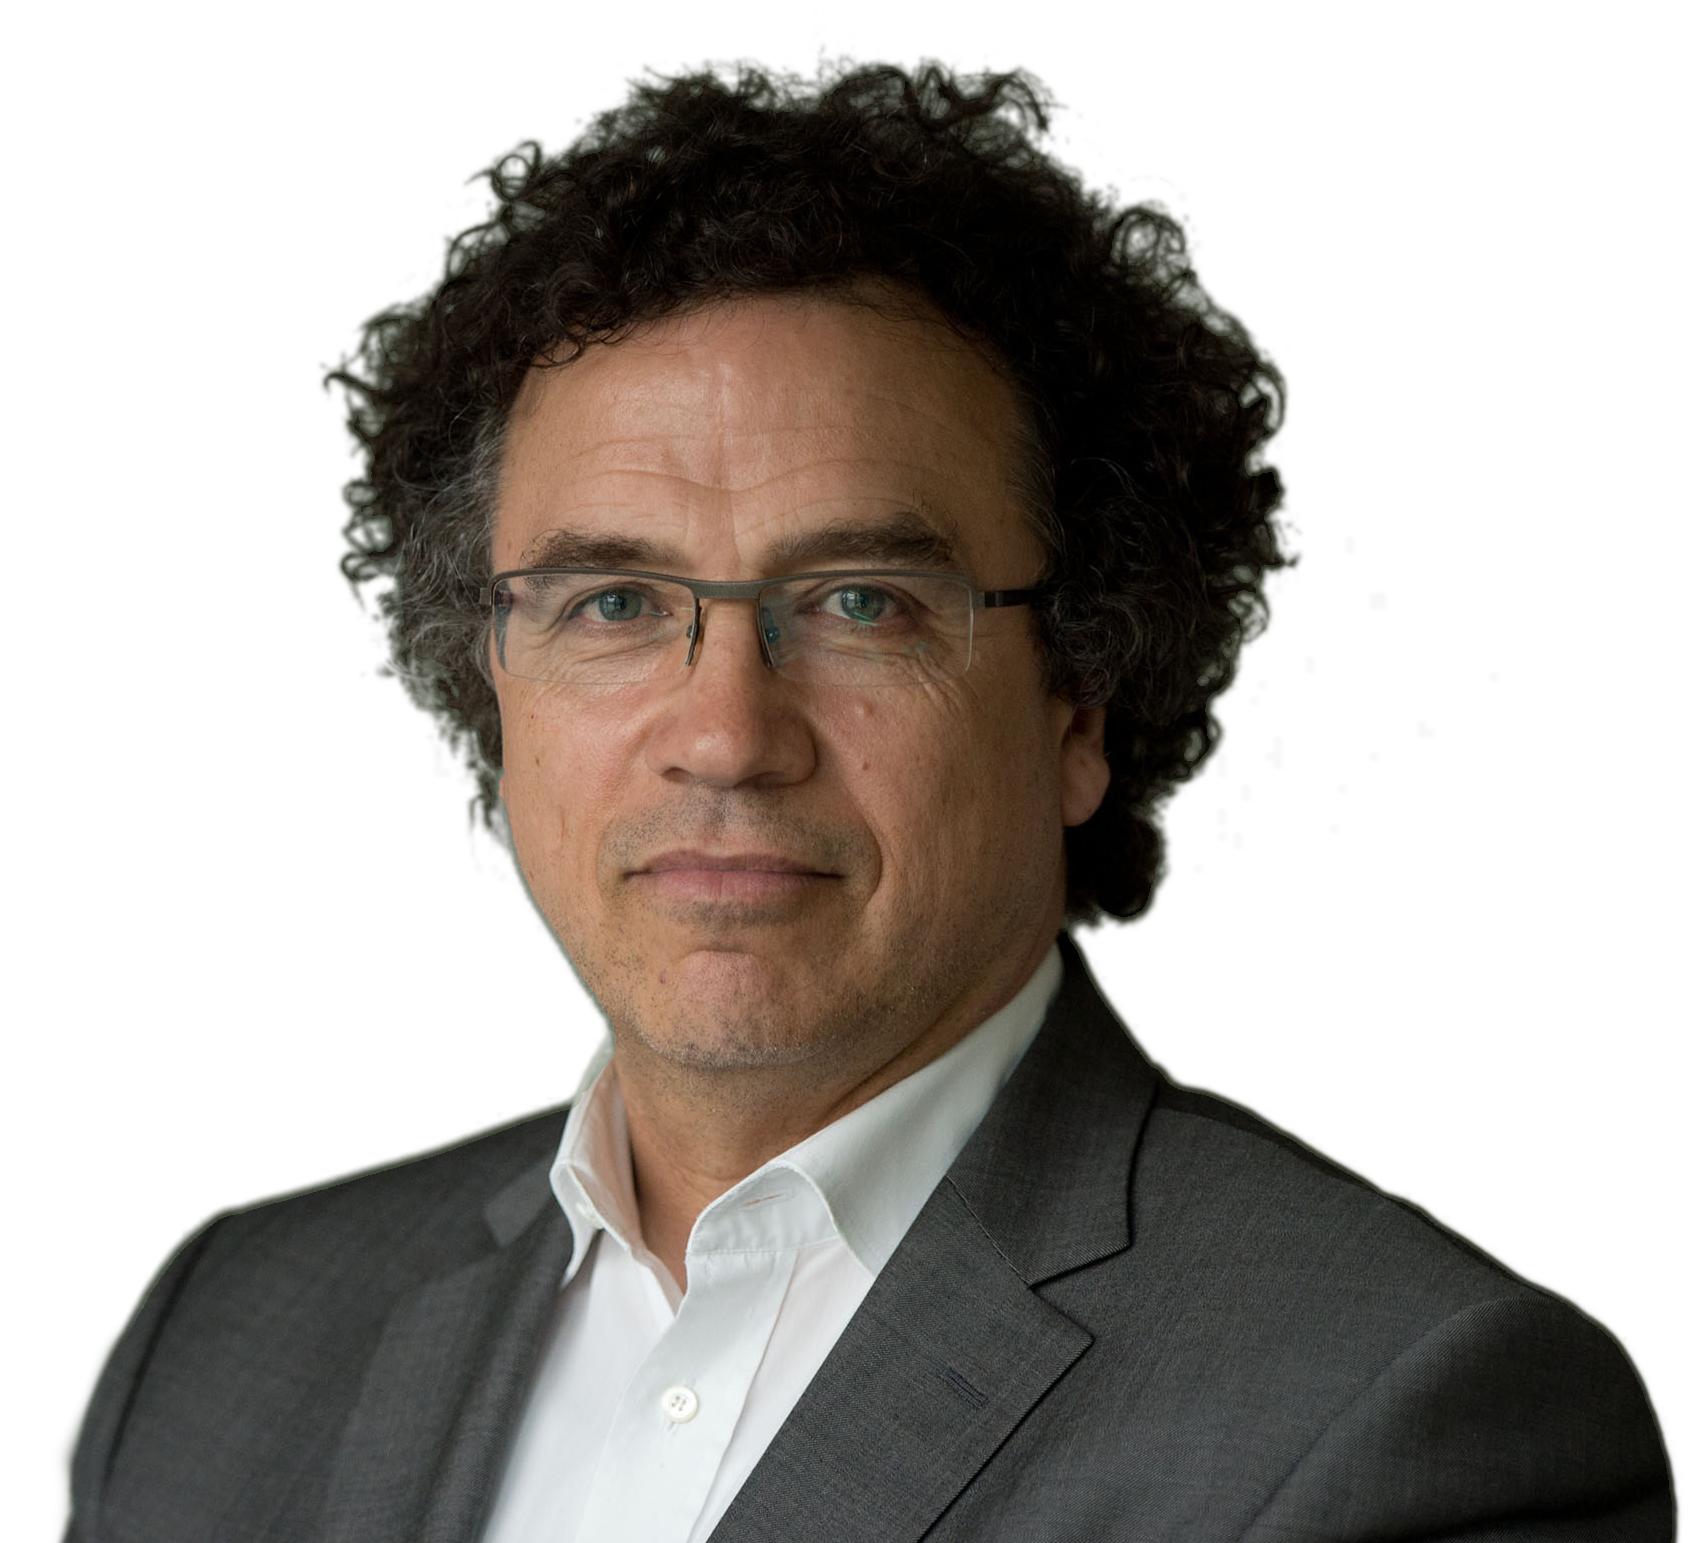 Frank Mangelsdorf